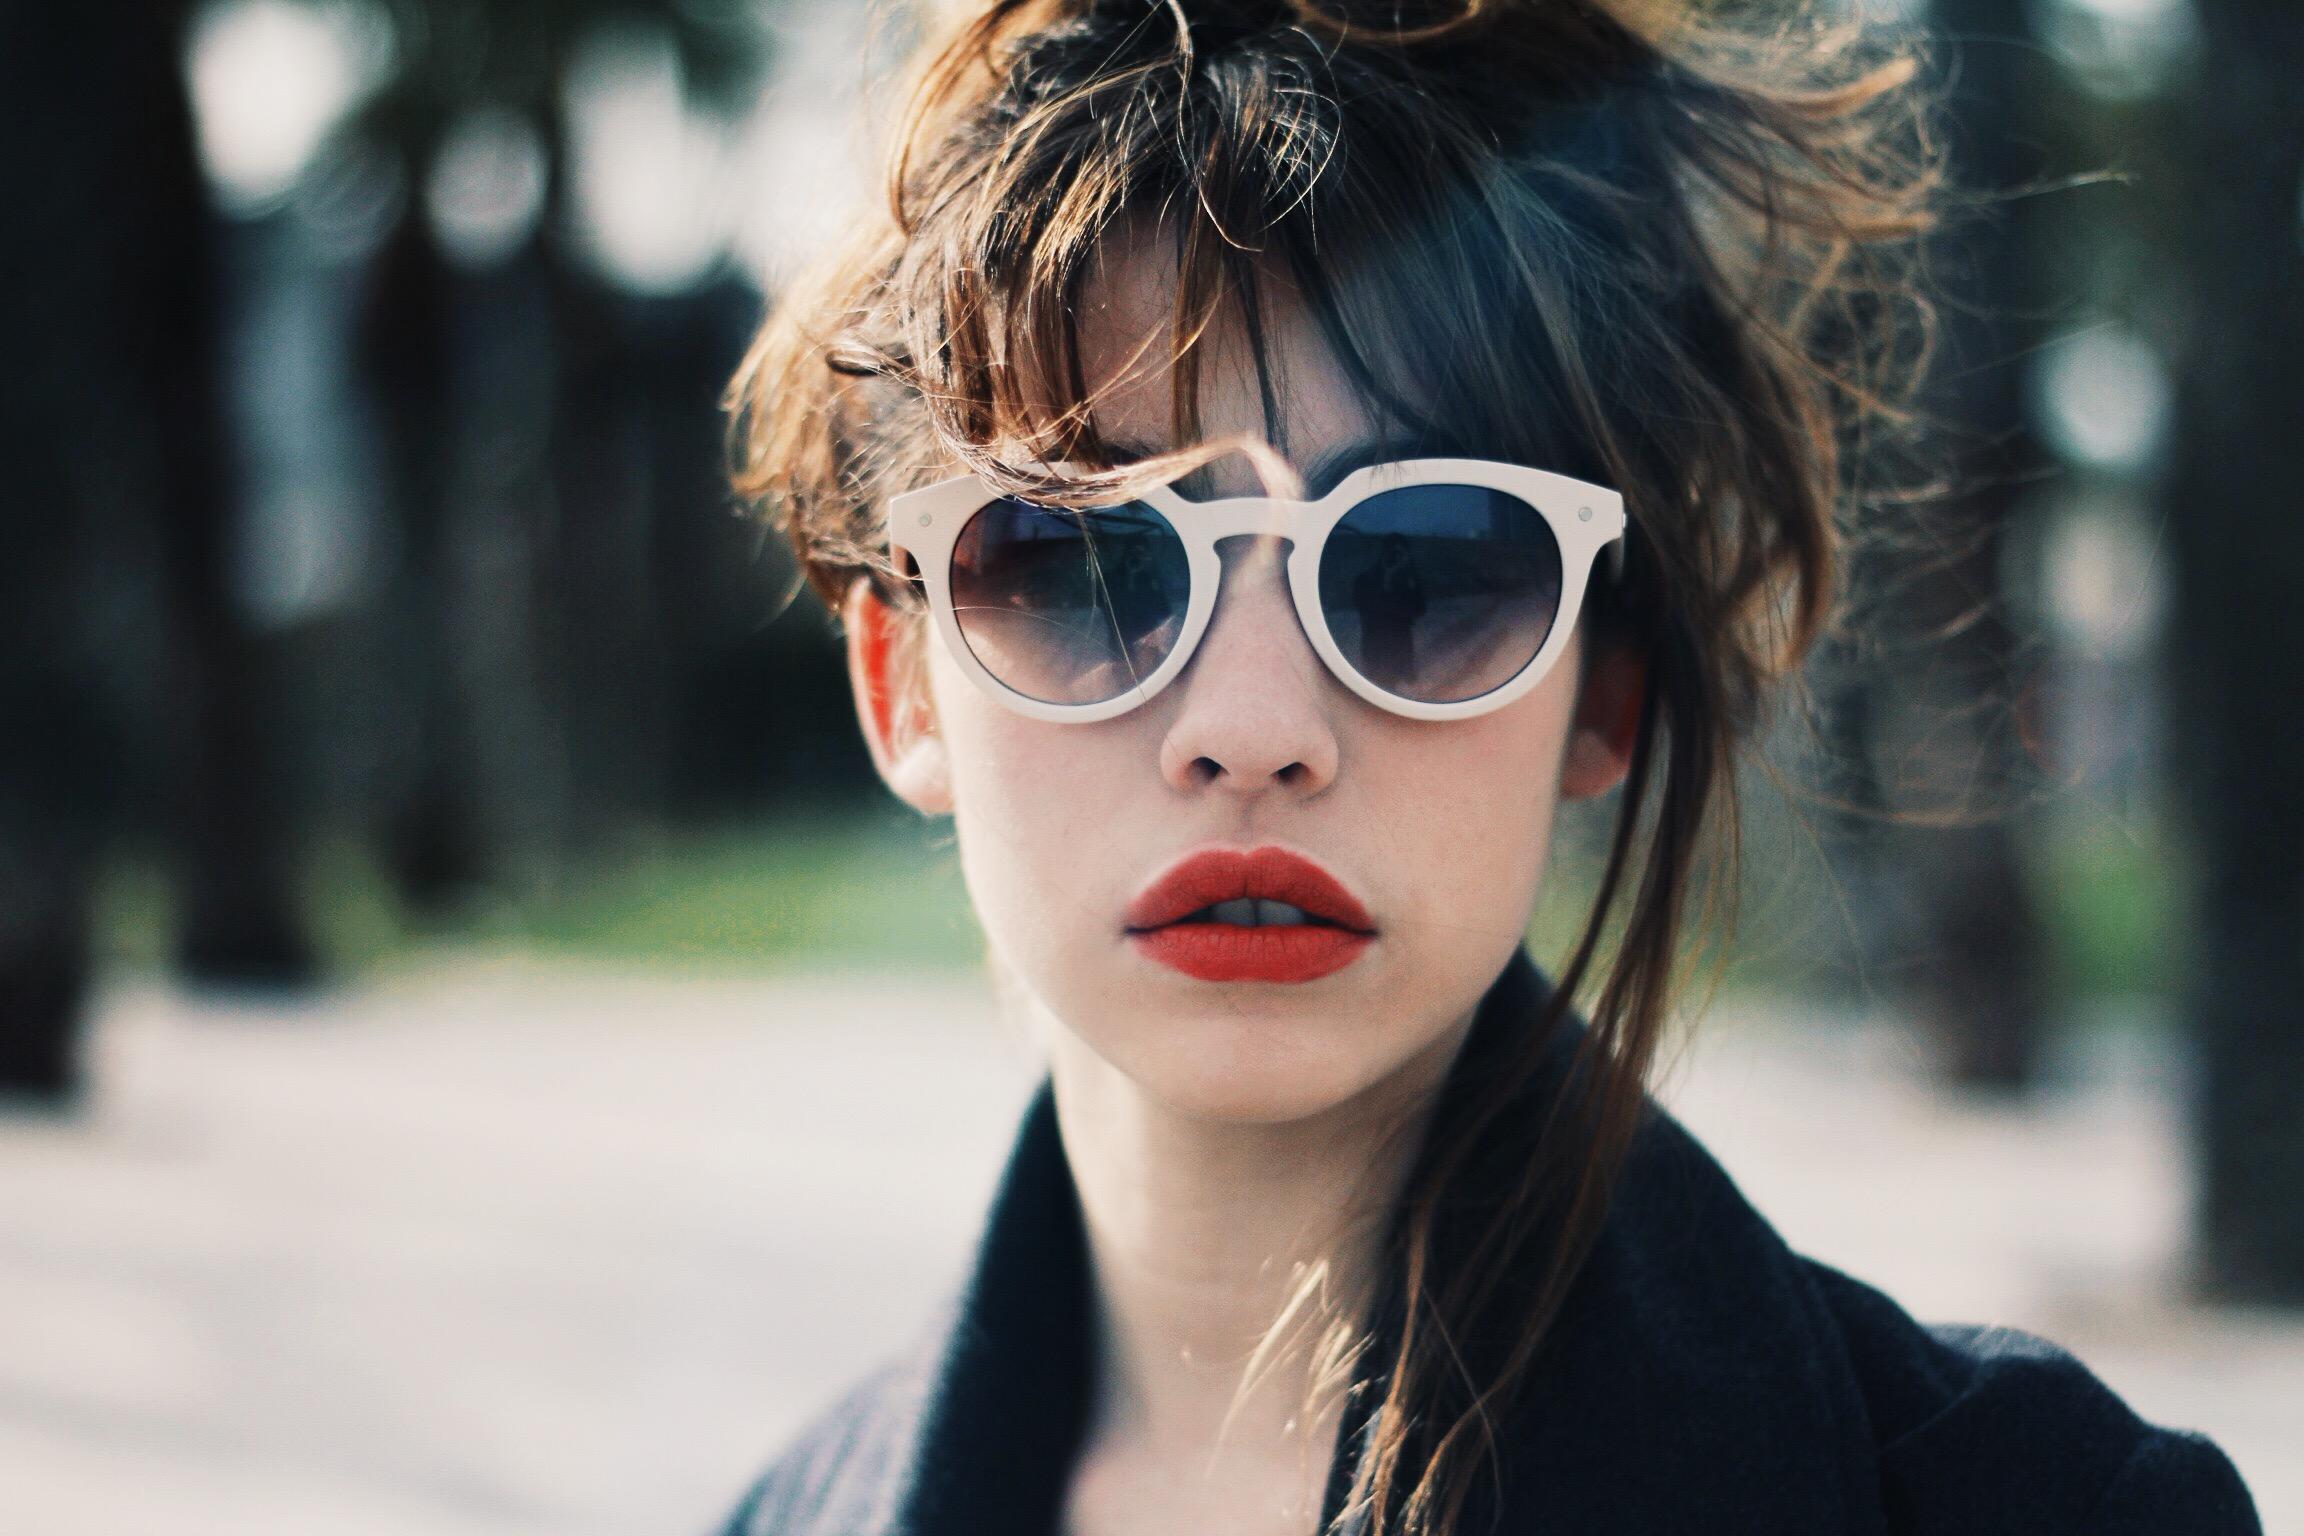 2ef4ed20d80a3 O modelo de óculos de sol ideal para o seu formato de rosto  AMIGA MARI  ajuda a descobrir! – MK